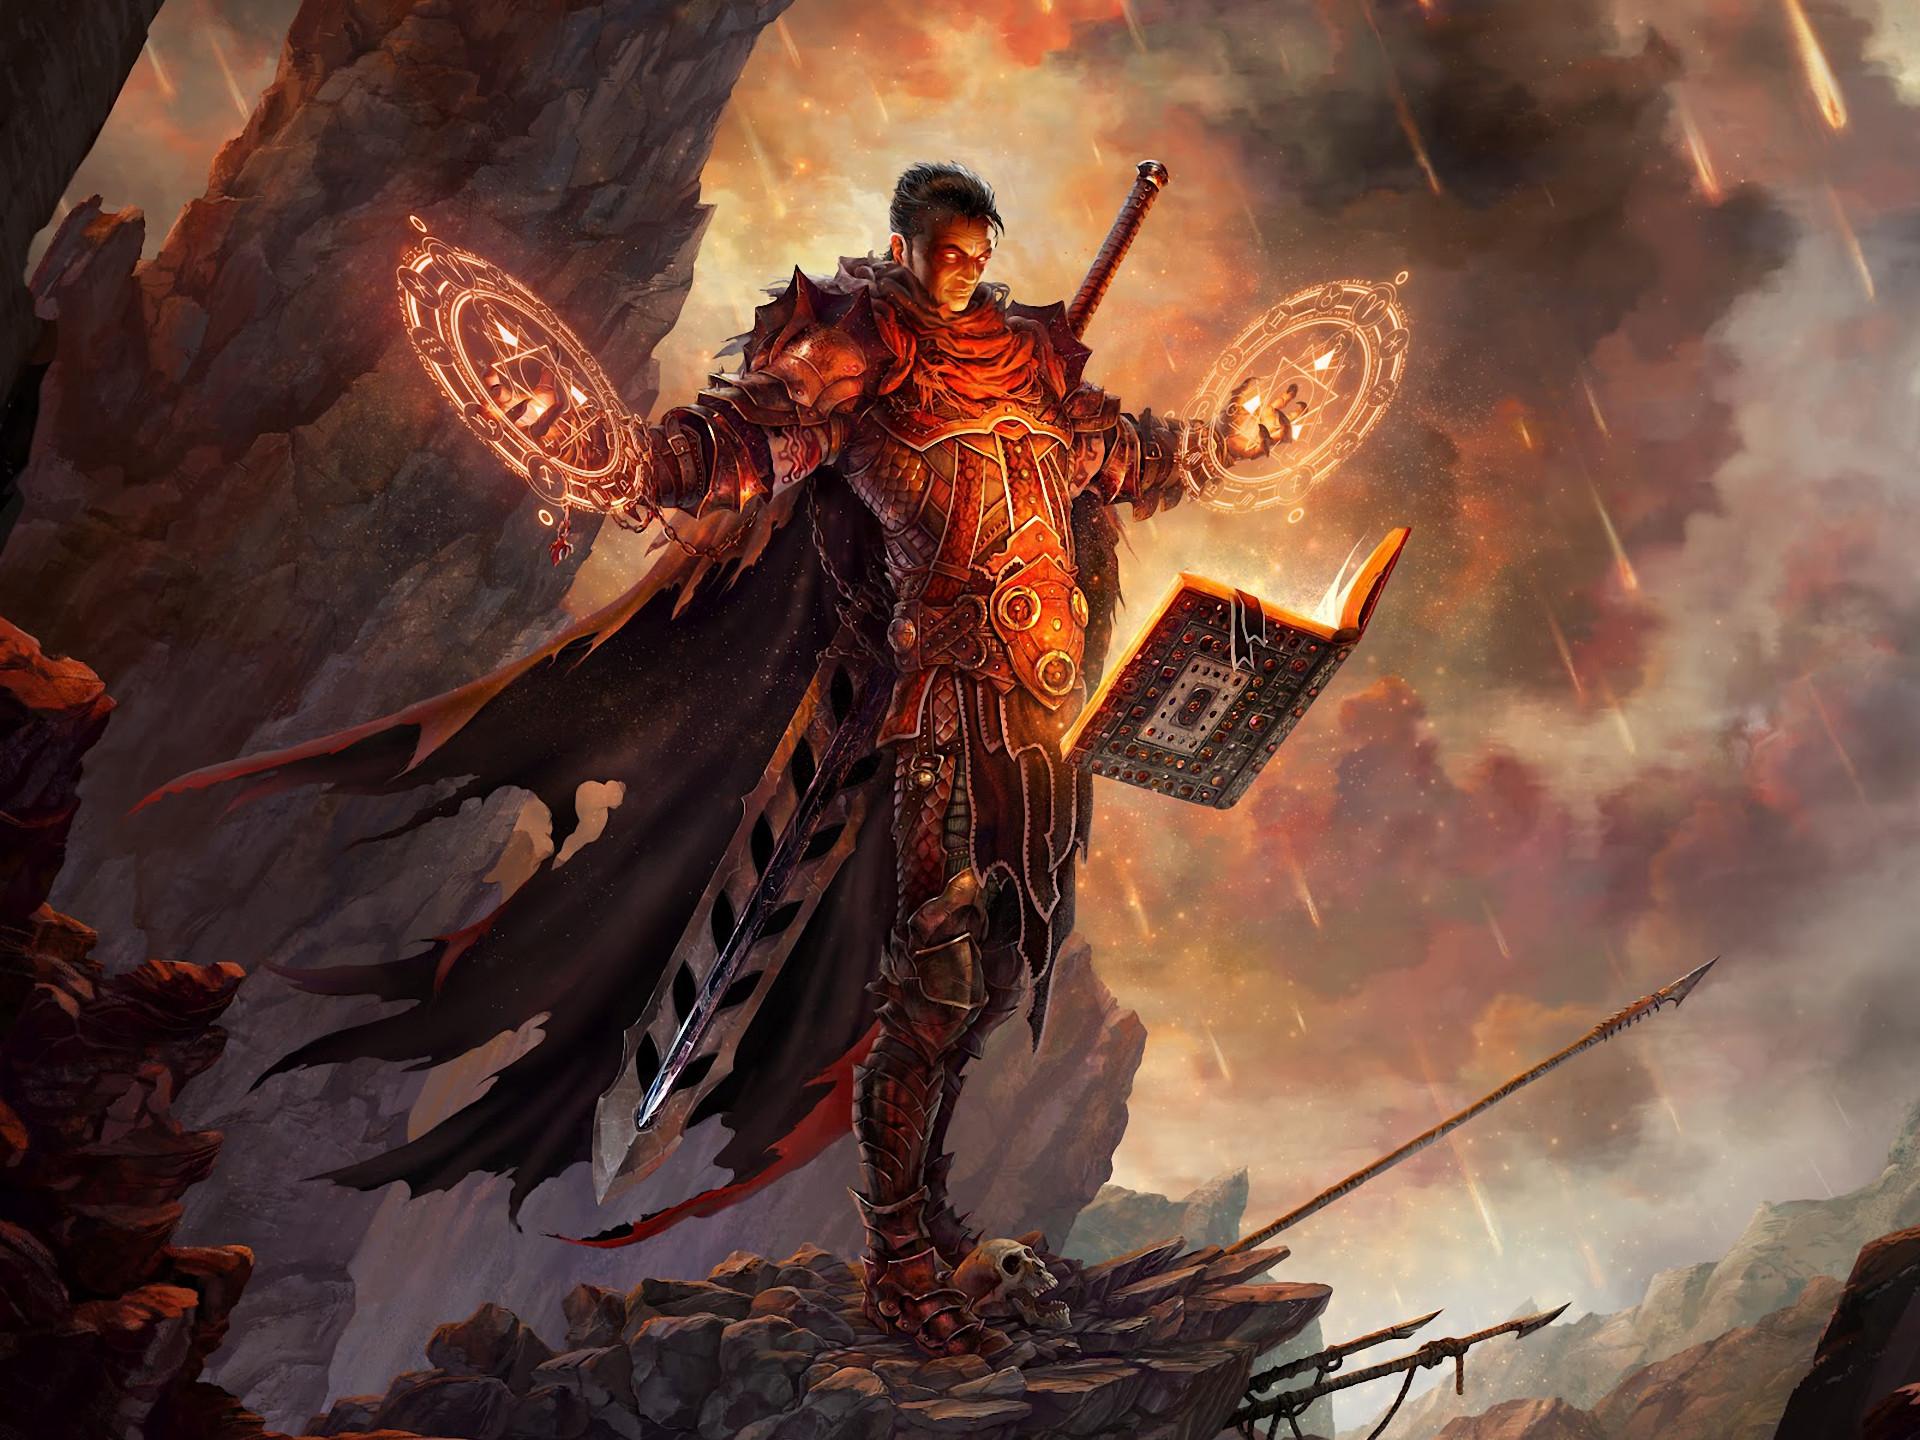 Mage Fantasy Art Books Artwork Realistic Swords Fresh New Hd Wallpaper  [Your Popular HD Wallpaper] (shared via SlingPic)